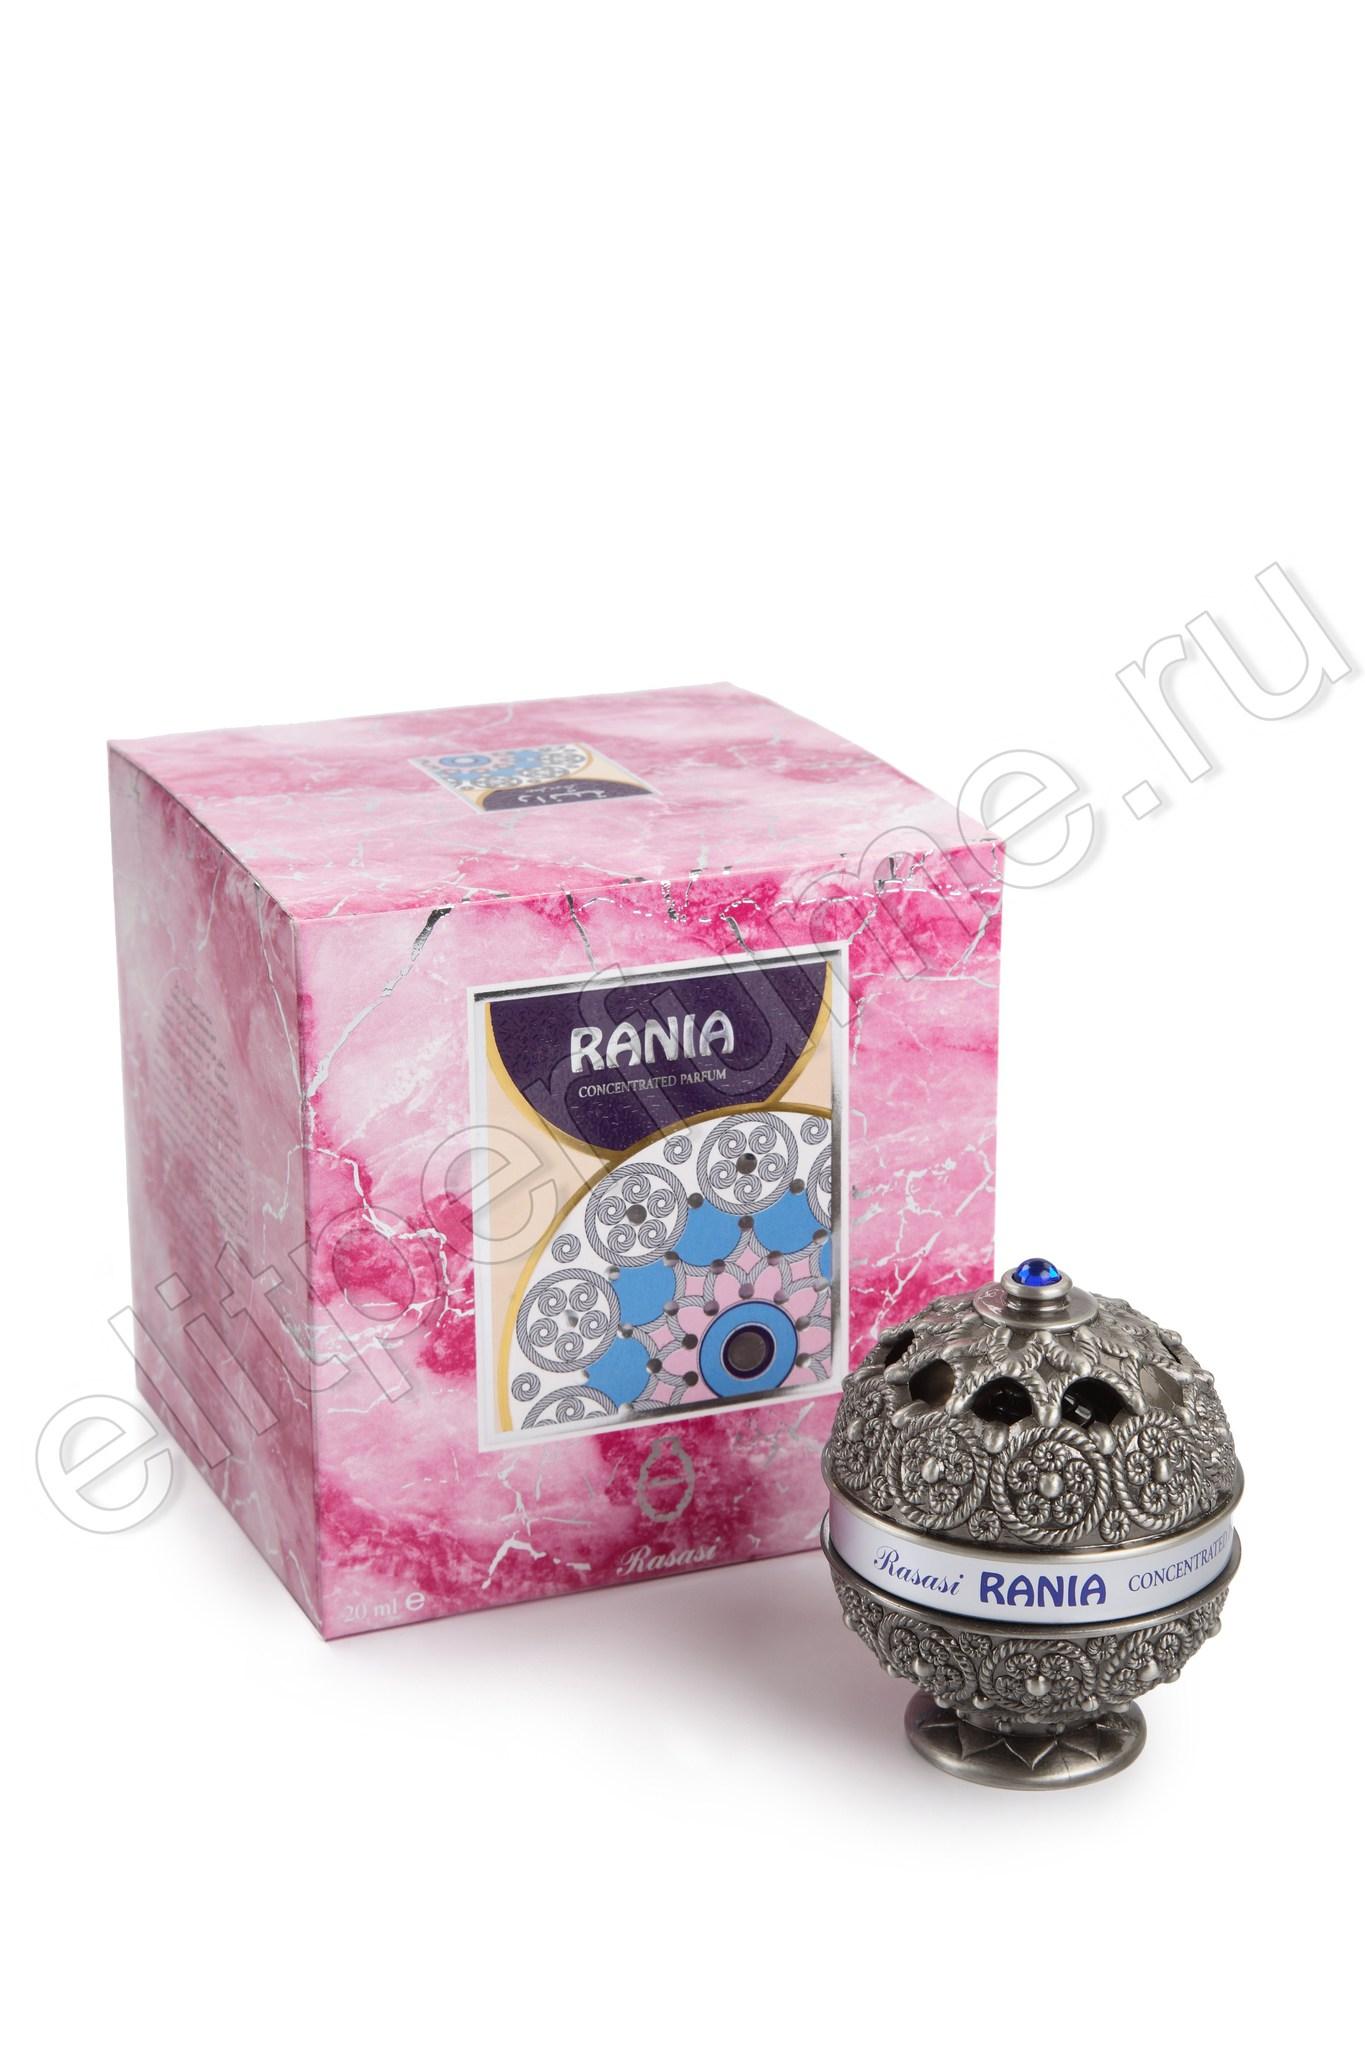 Рания Rania 20 мл арабские масляные духи от Расаси Rasasi Perfumes